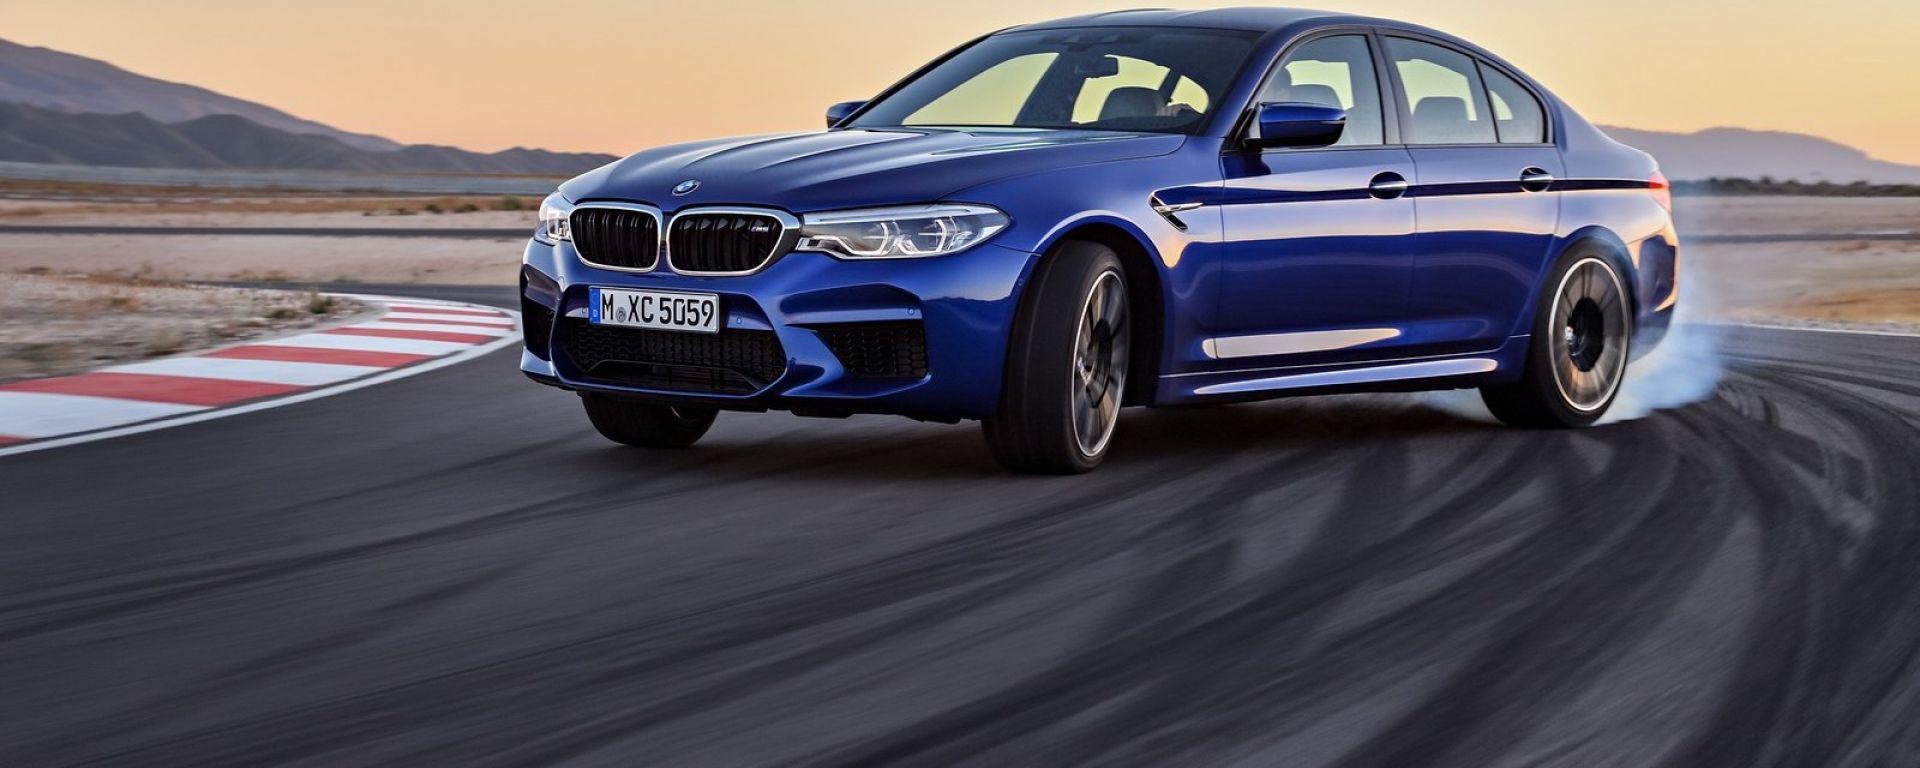 Nuova BMW M5 2018, avrà anche il Competition Package